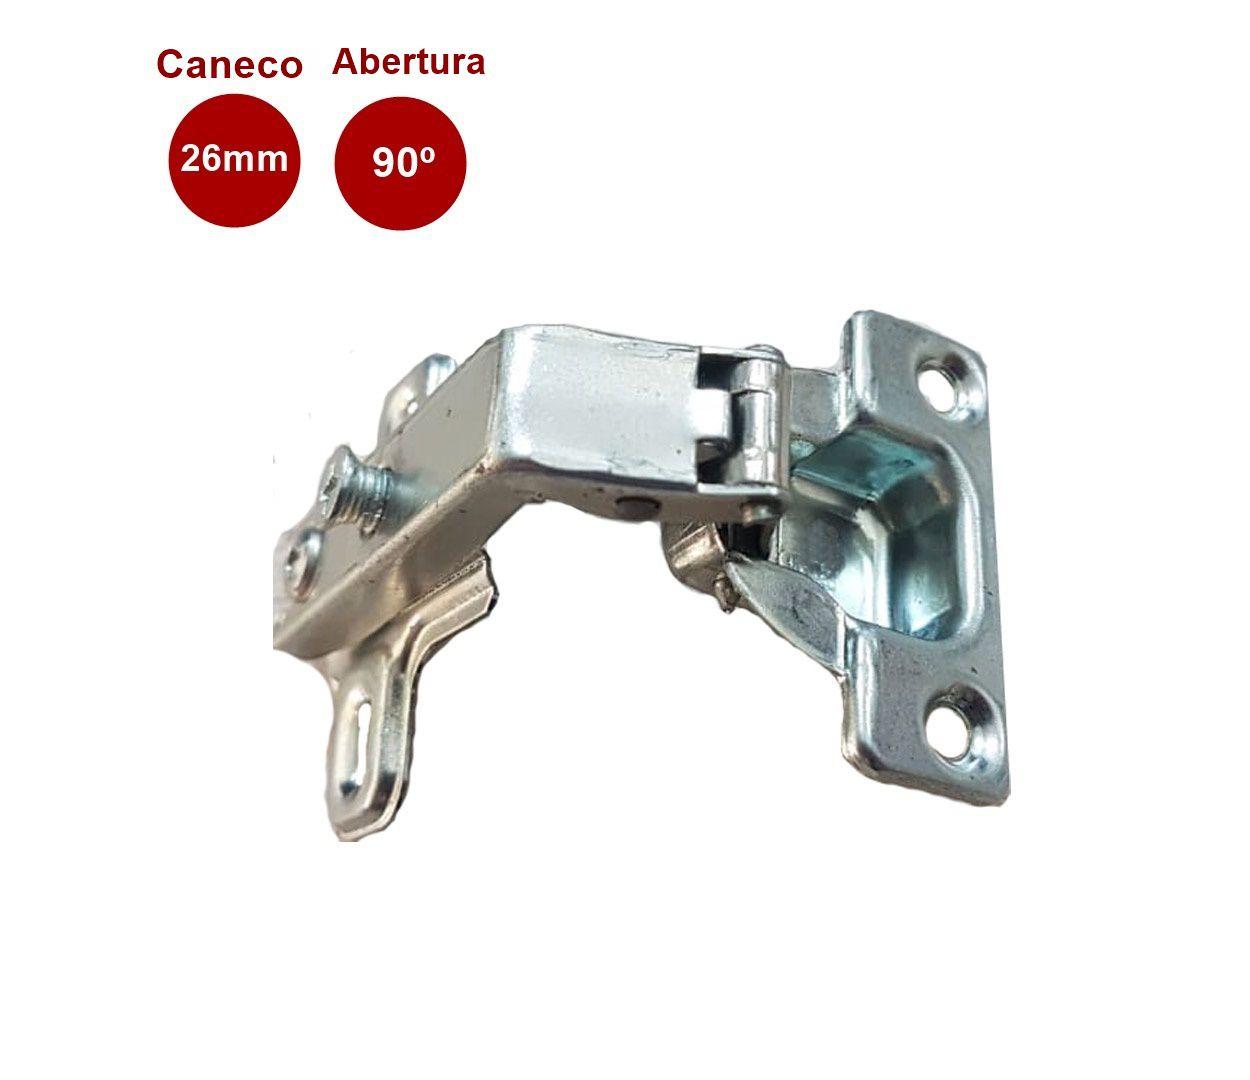 Mini Dobradiça 90° Caneco 26mm